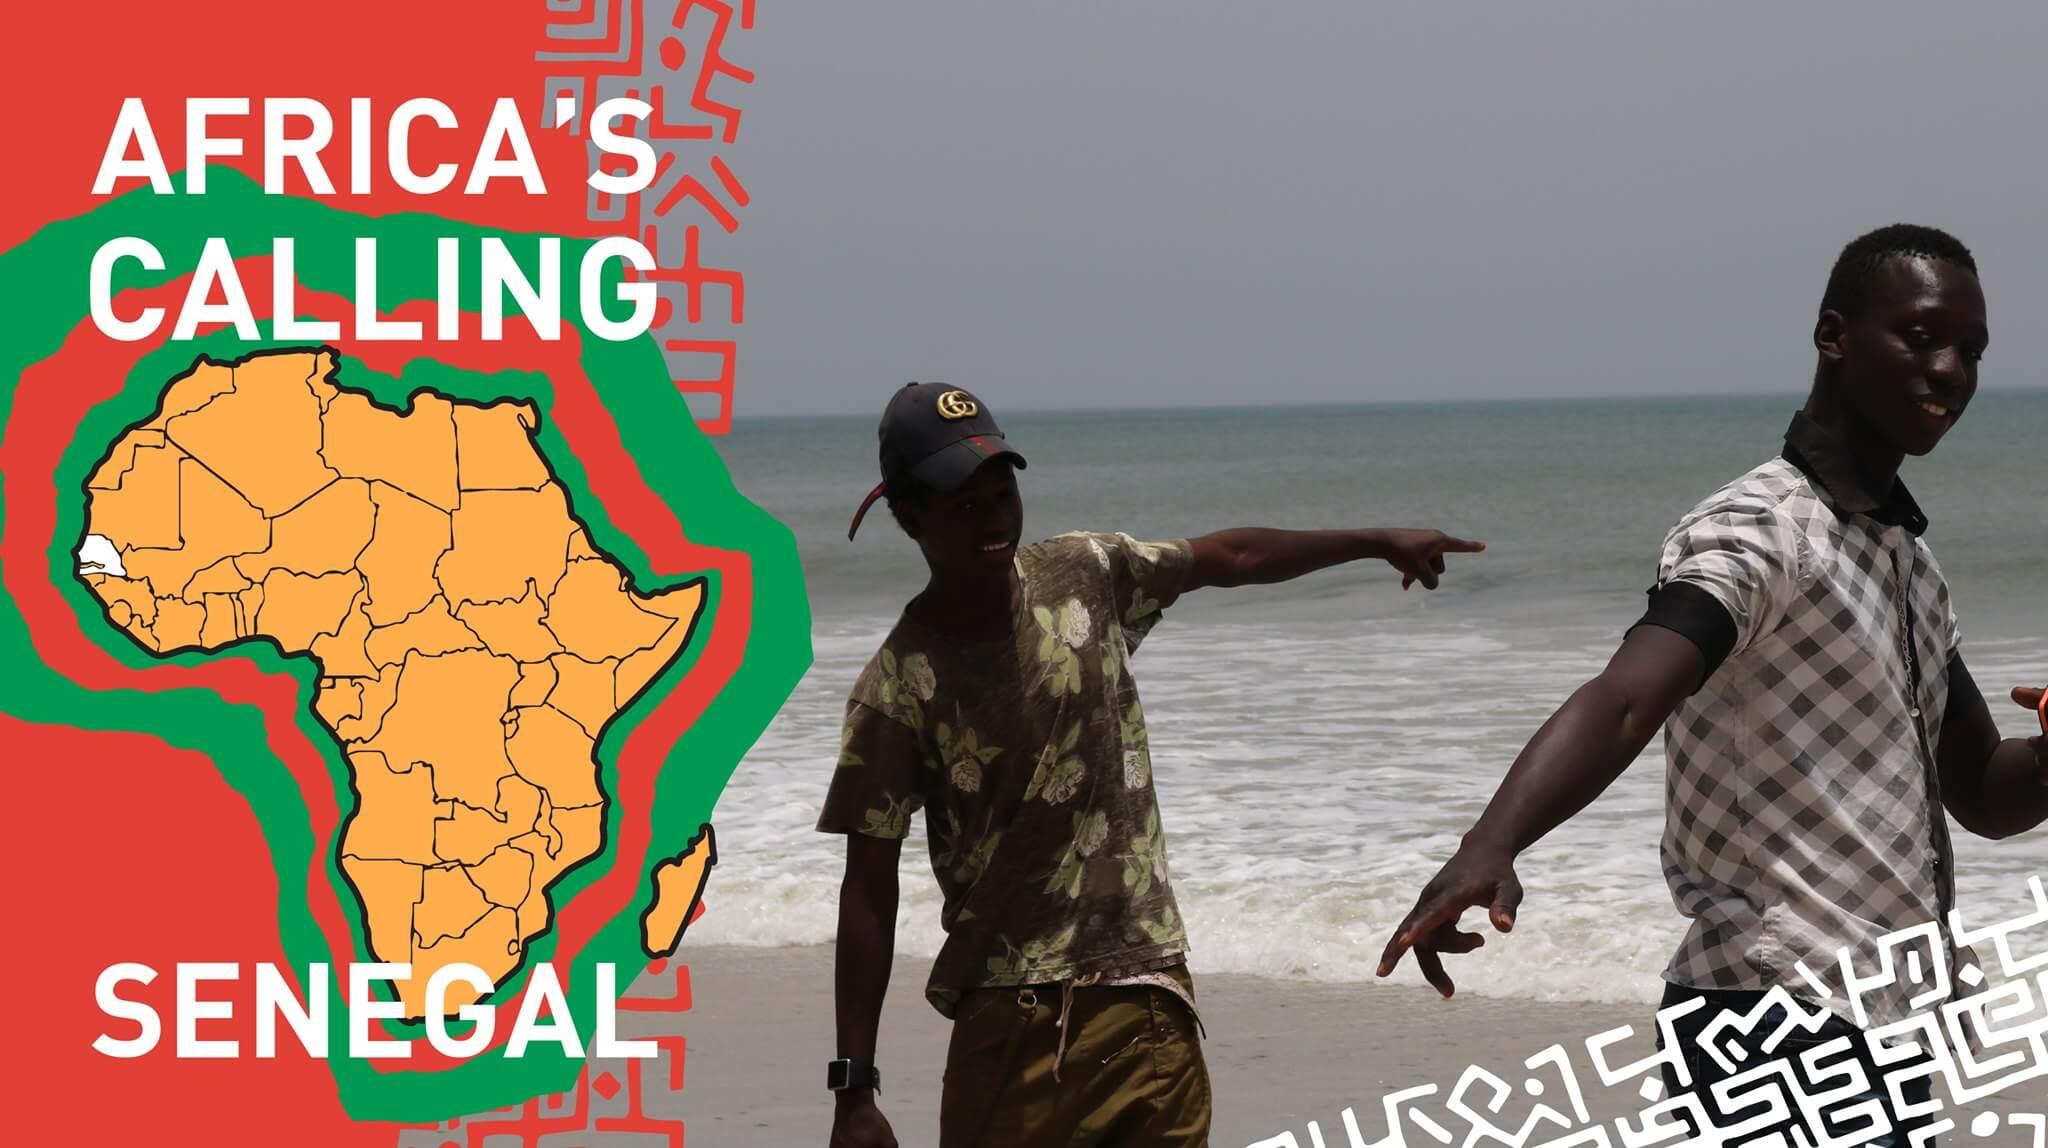 Africa's Calling: Senegal